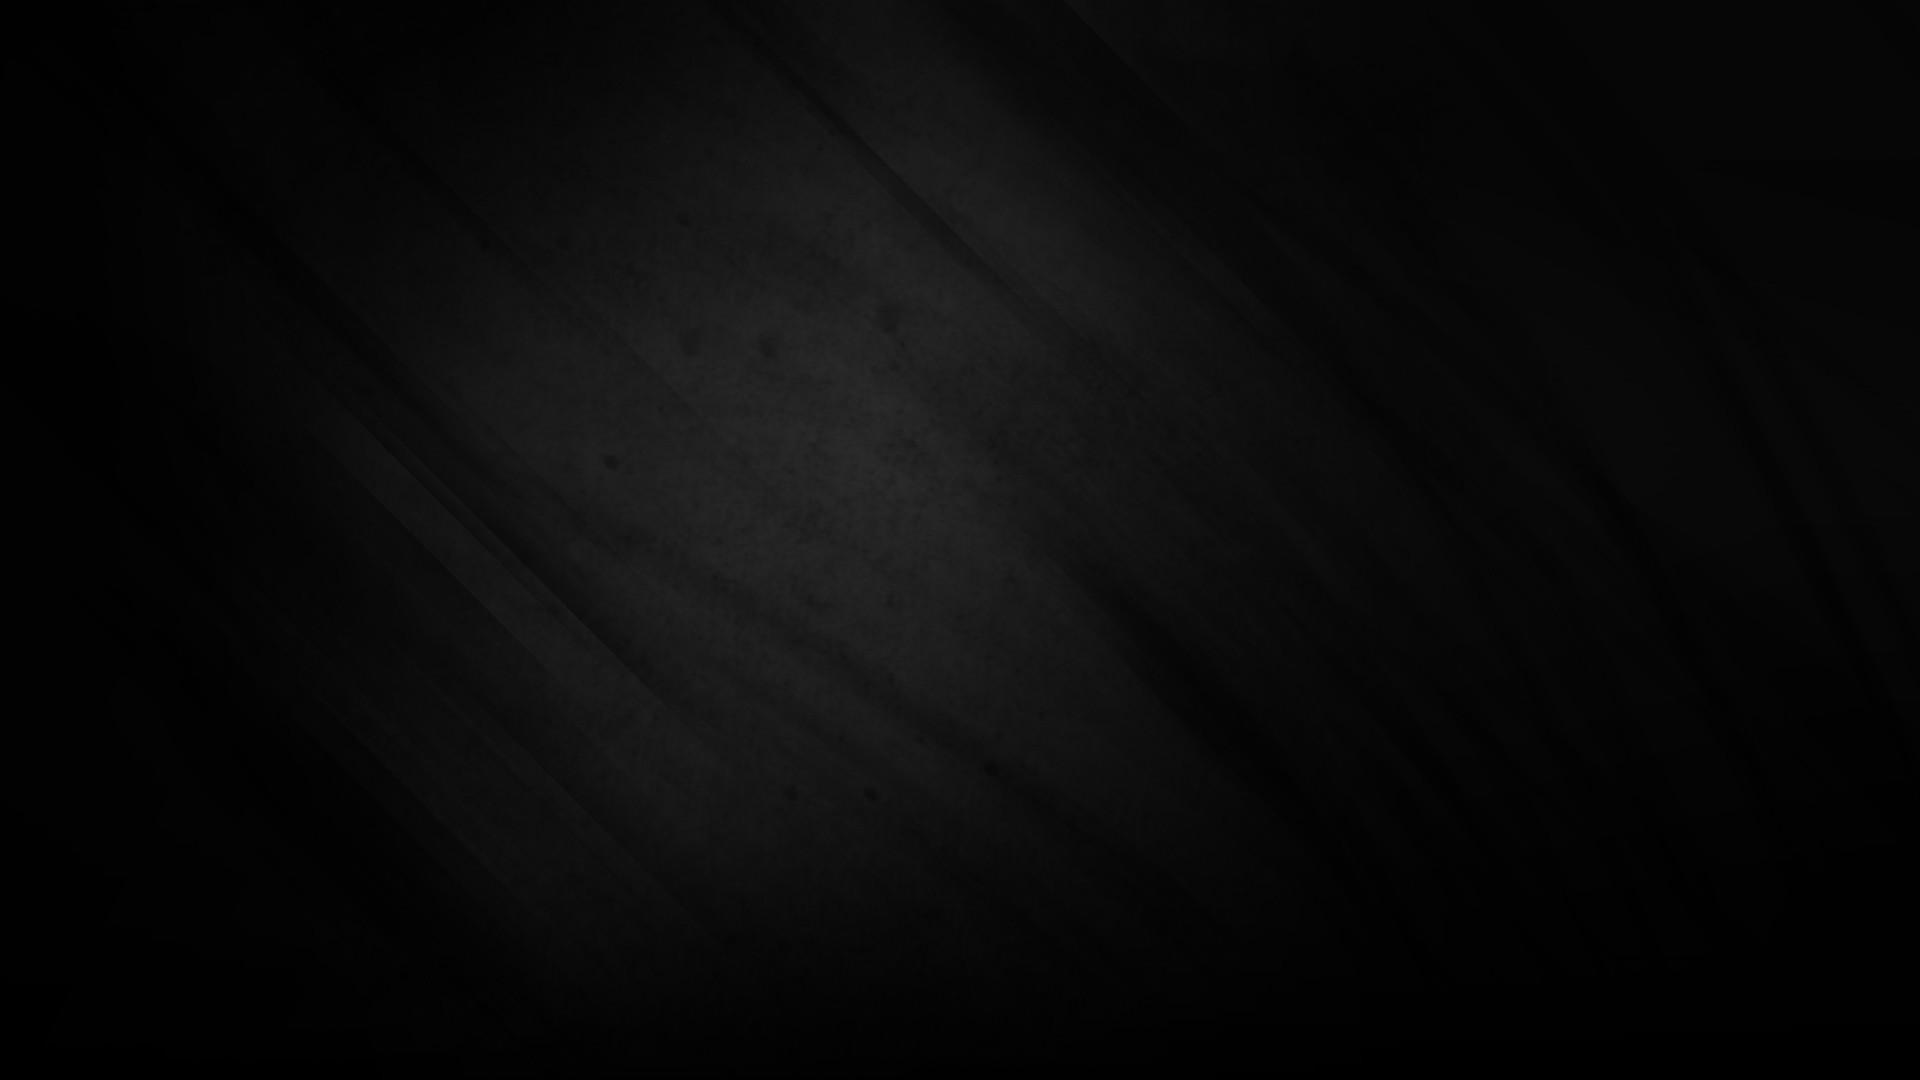 Trippy-Shroom-Wallpapers-4c44ffb3128ea2386e94675af604a8e4-1.jpg